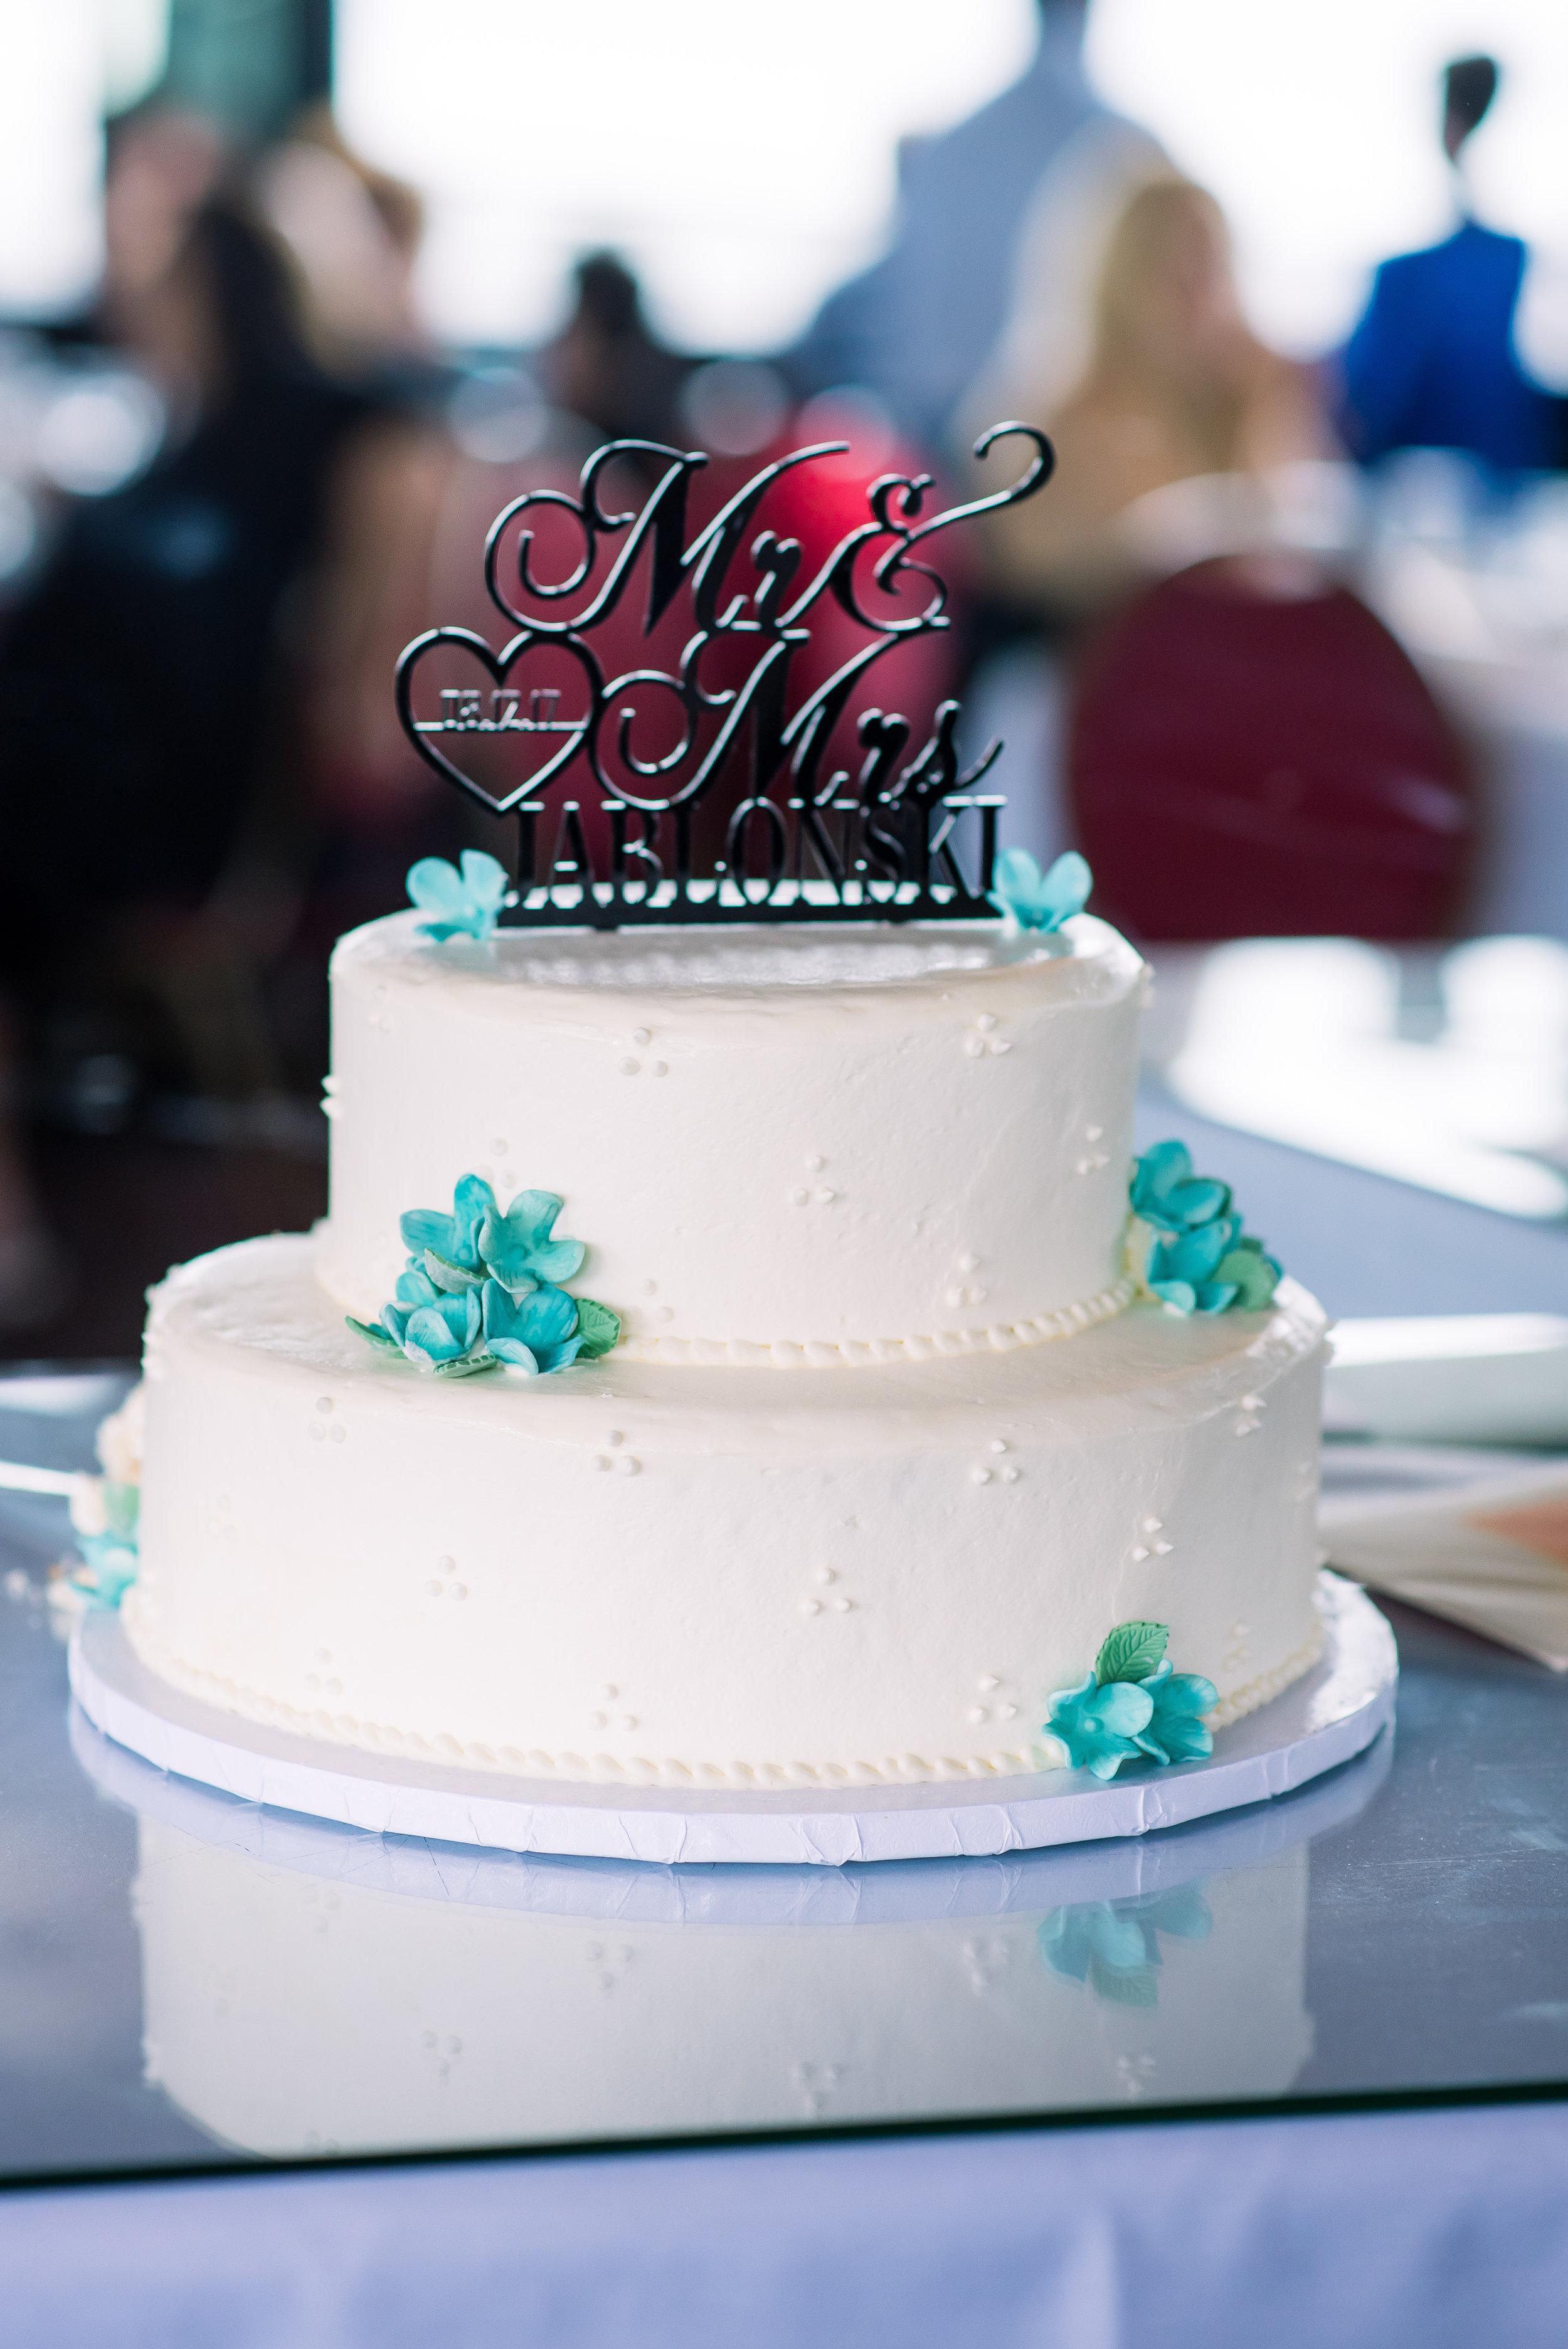 Konditor Miester's wedding cake at Isaacs restaurant  plymouth ma (45 of 1).jpg